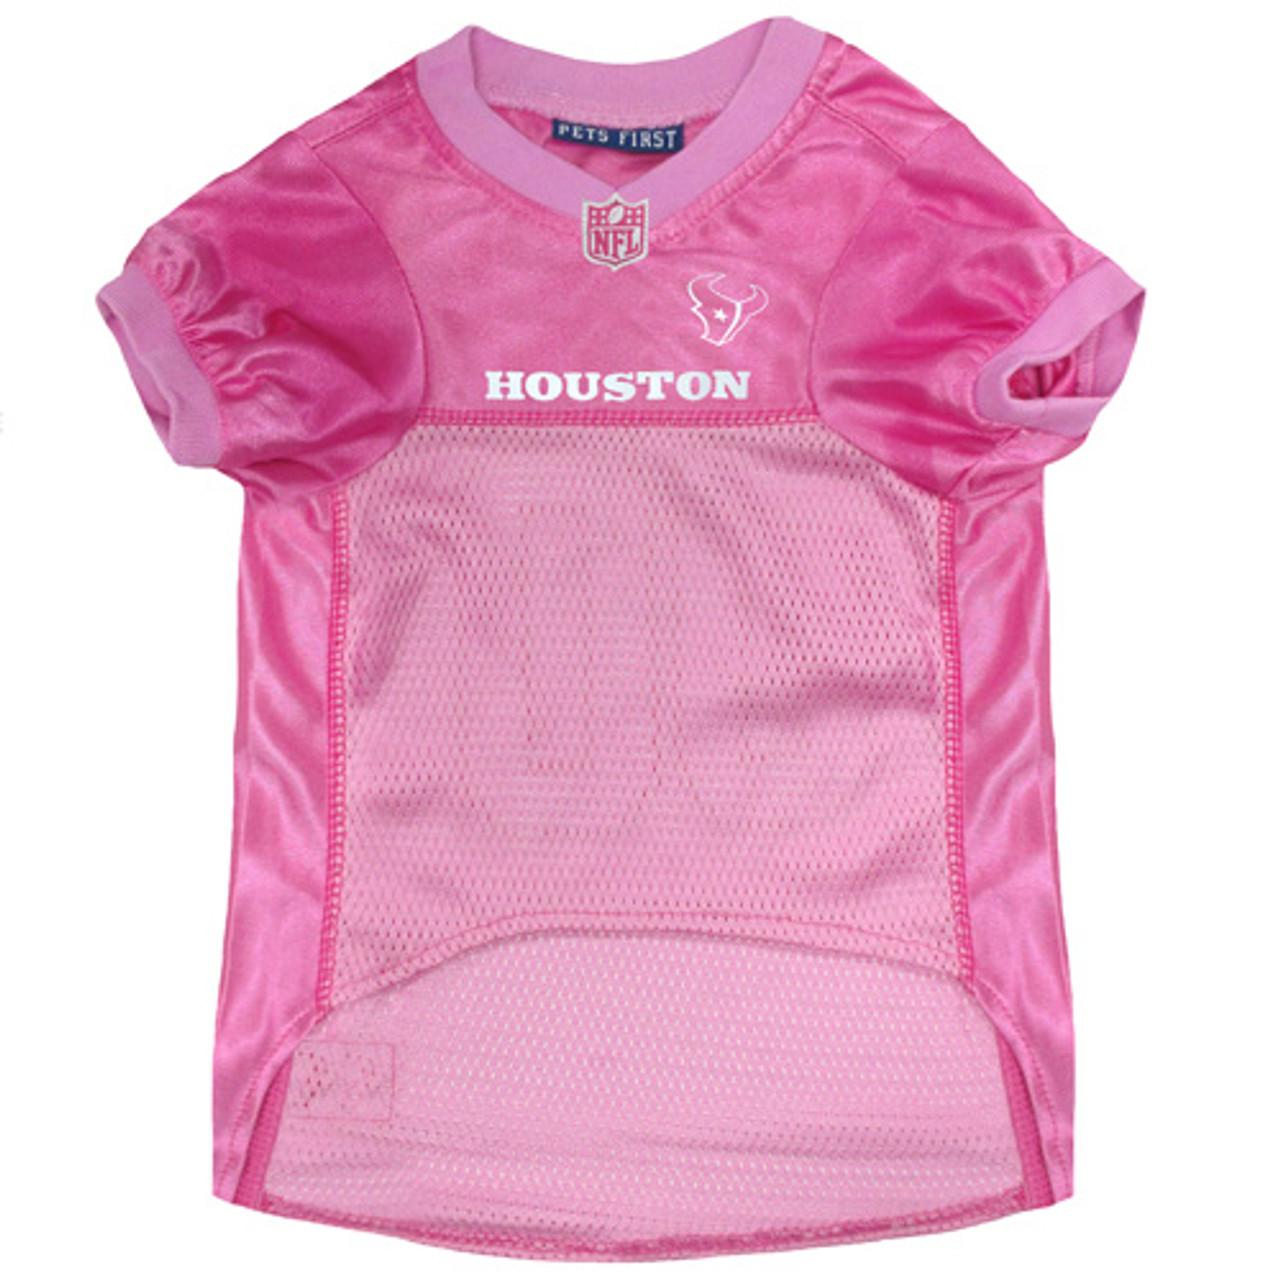 online store dbc7e 5f55b Houston Texans Pink Pet Jersey